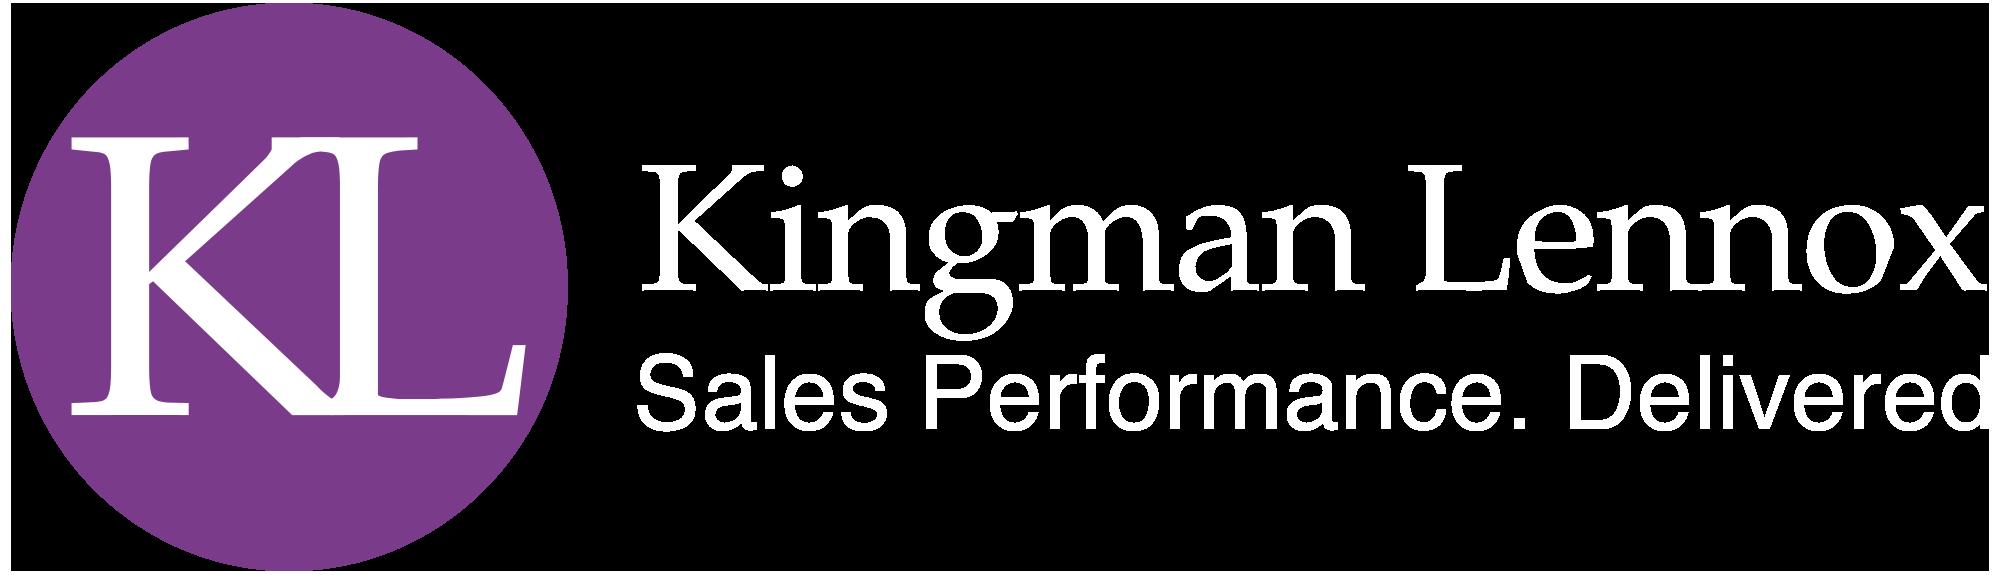 Kingman Lennox